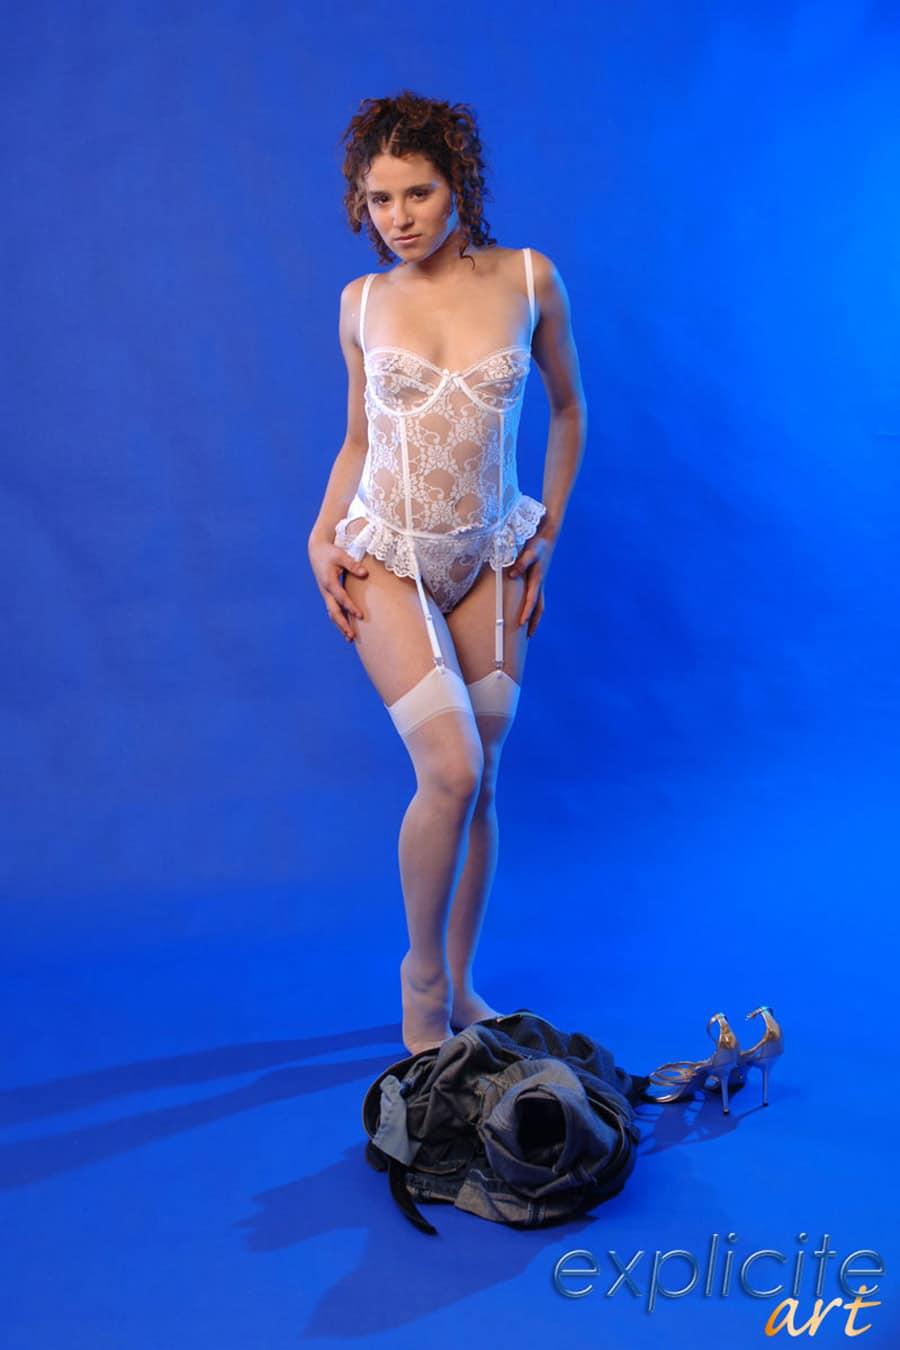 roxanne-babe-algerienne-striptease-expliciteart-2